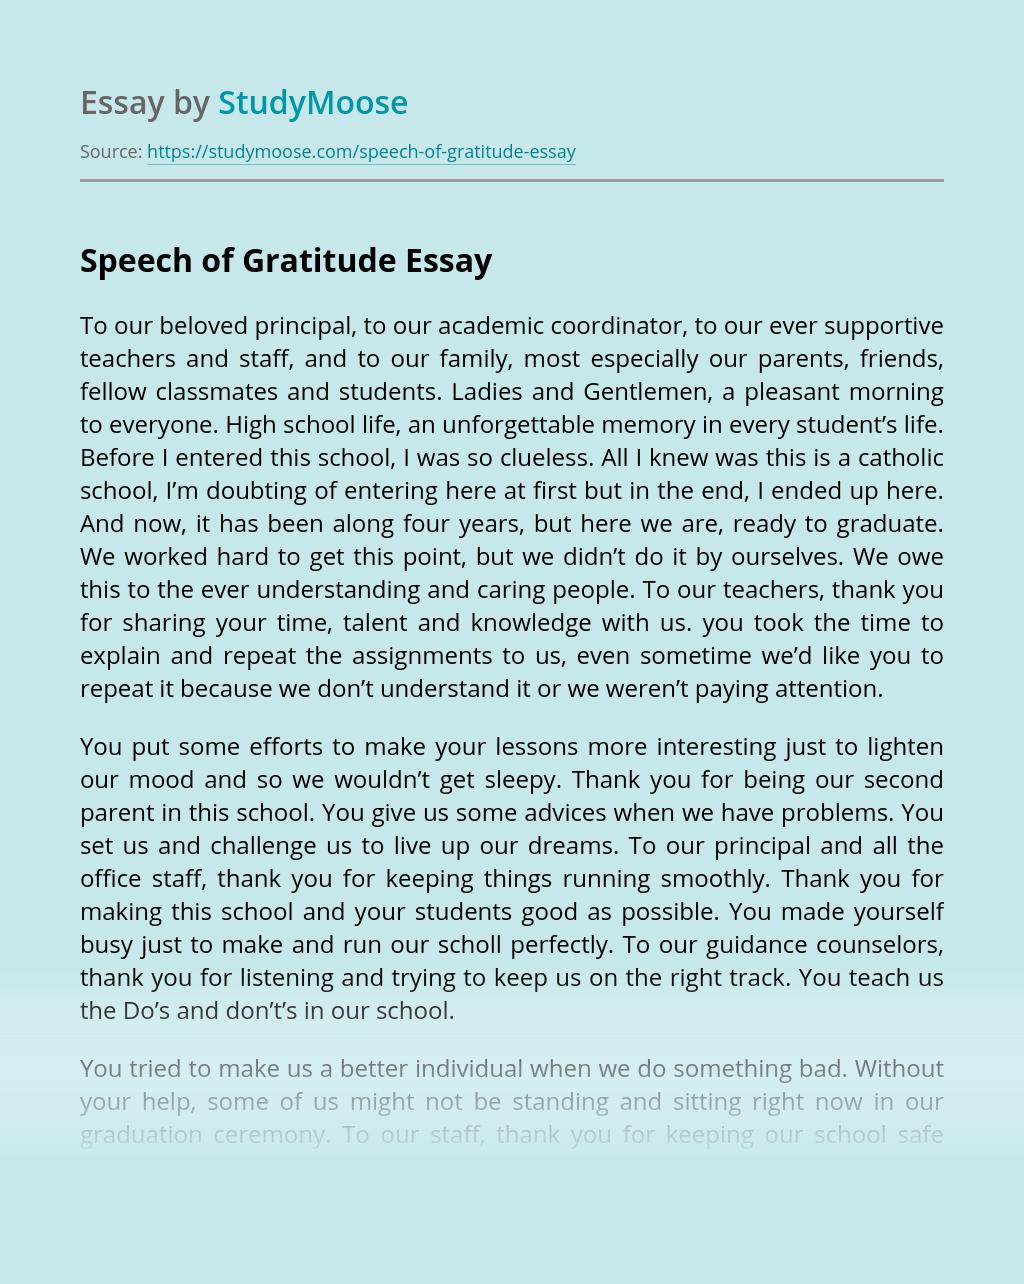 Speech of Gratitude